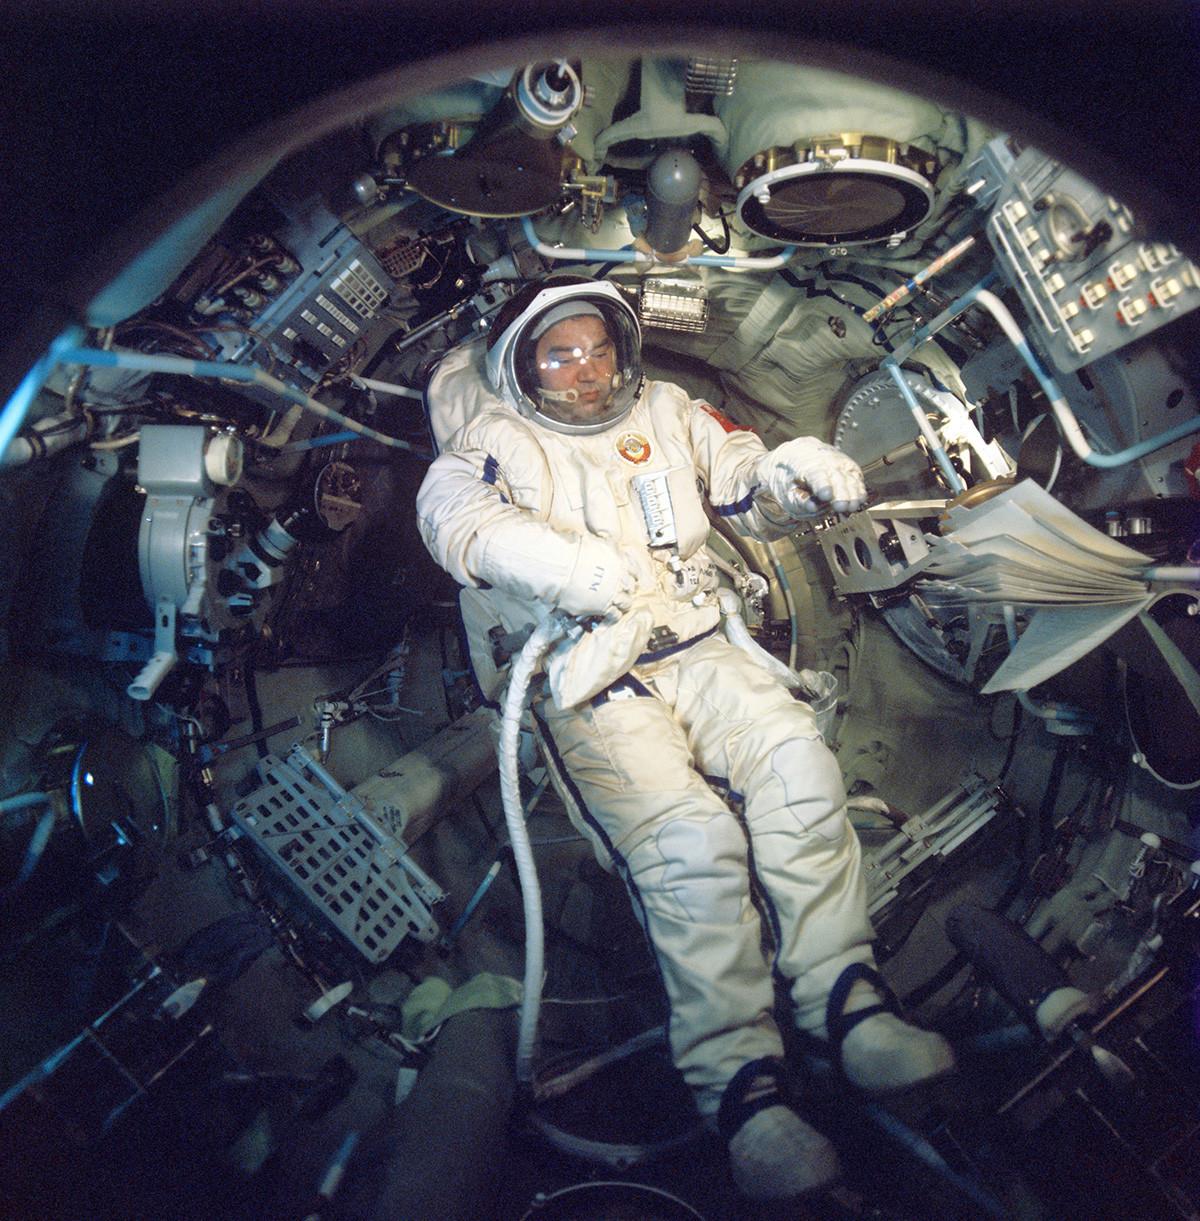 Der sowjetische Kosmonaut Georgy Gretschko (Flugingenieur) an Bord des Weltraumkomplexes 'Sojus-26' - 'Saljut-6', 1978.